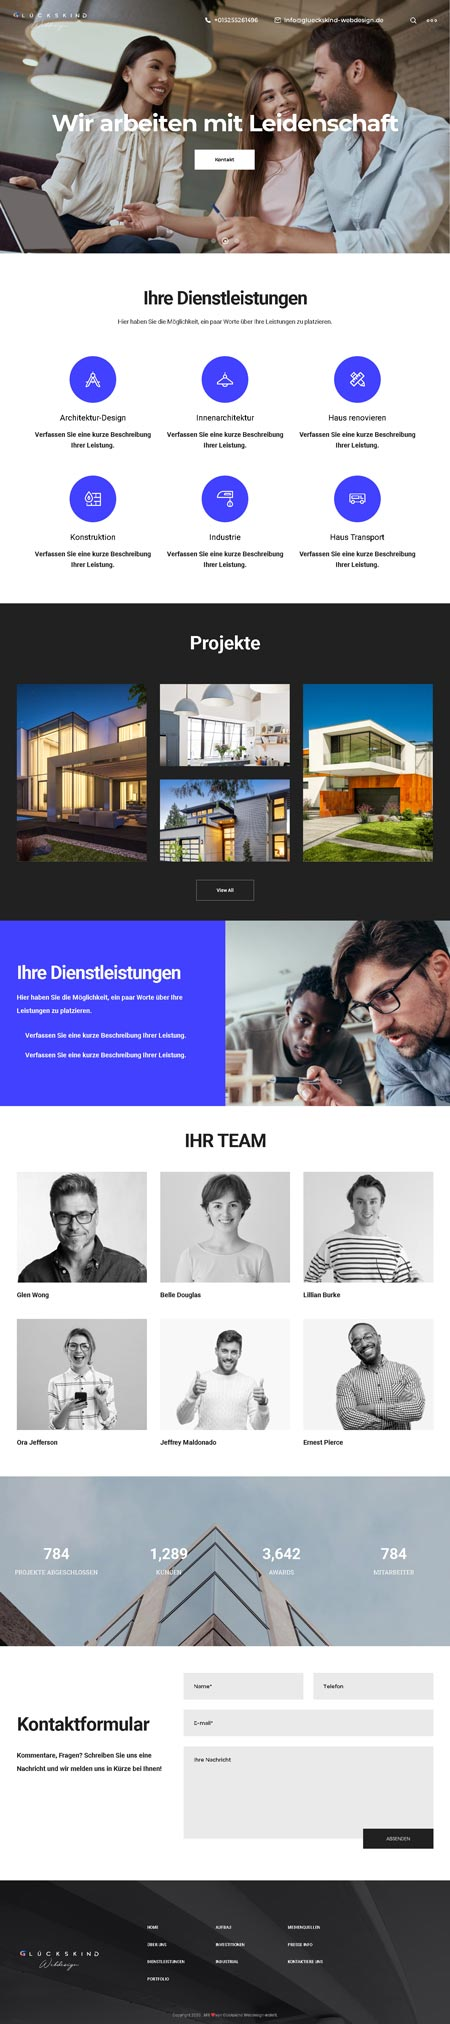 Architekt Libeskind - Glückskind Webdesign Musterkatalog